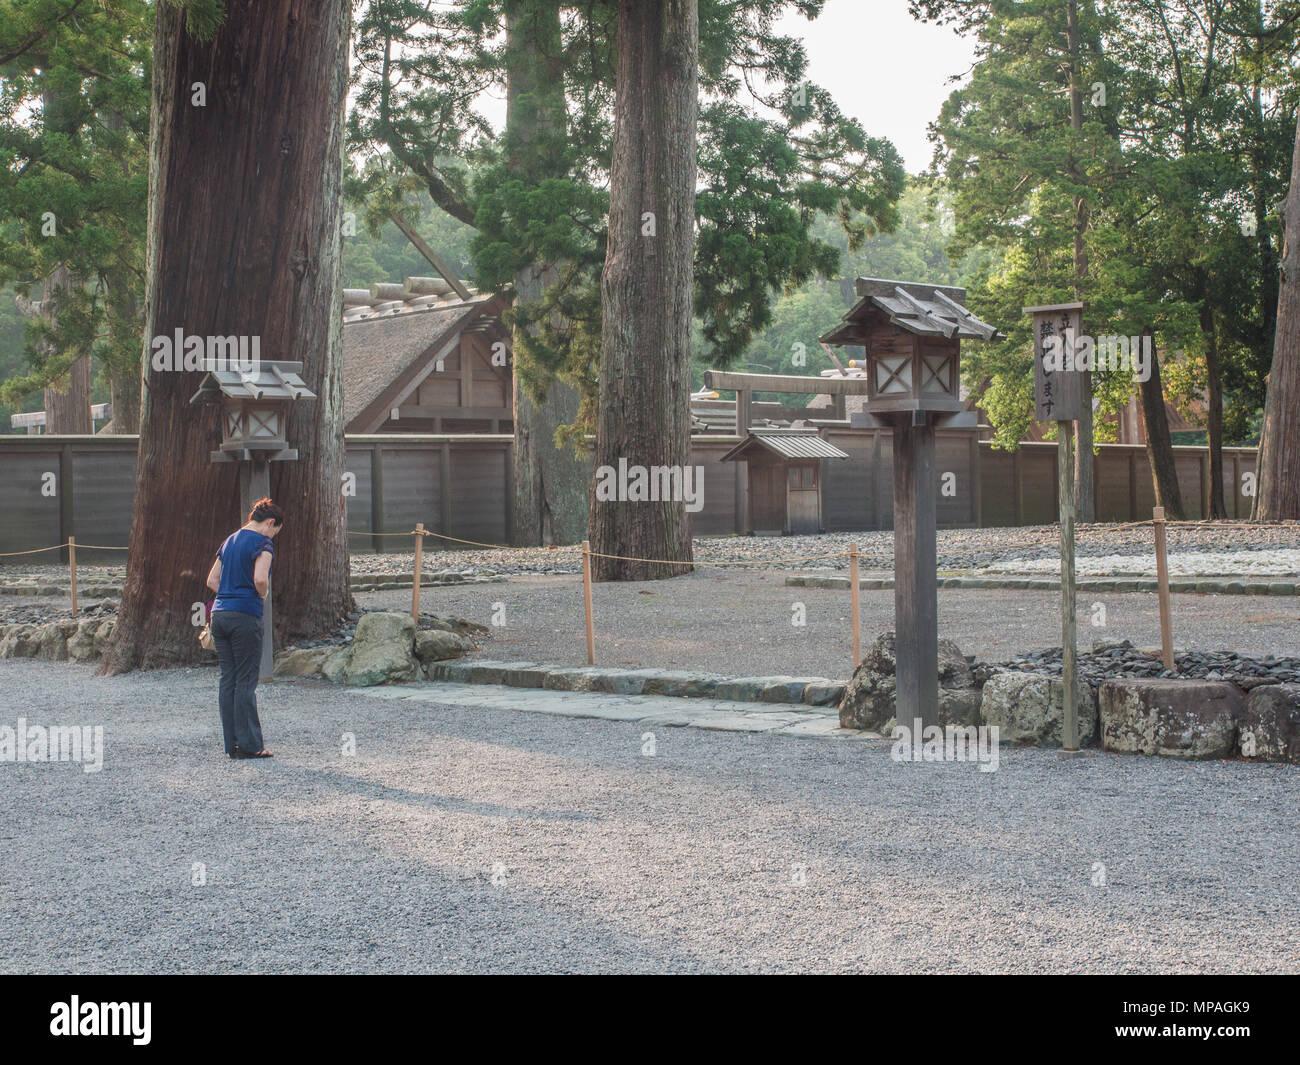 A woman praying in front of Goshoden Kodenchi, Geku, Ise Jingu, Mie, Japan - Stock Image